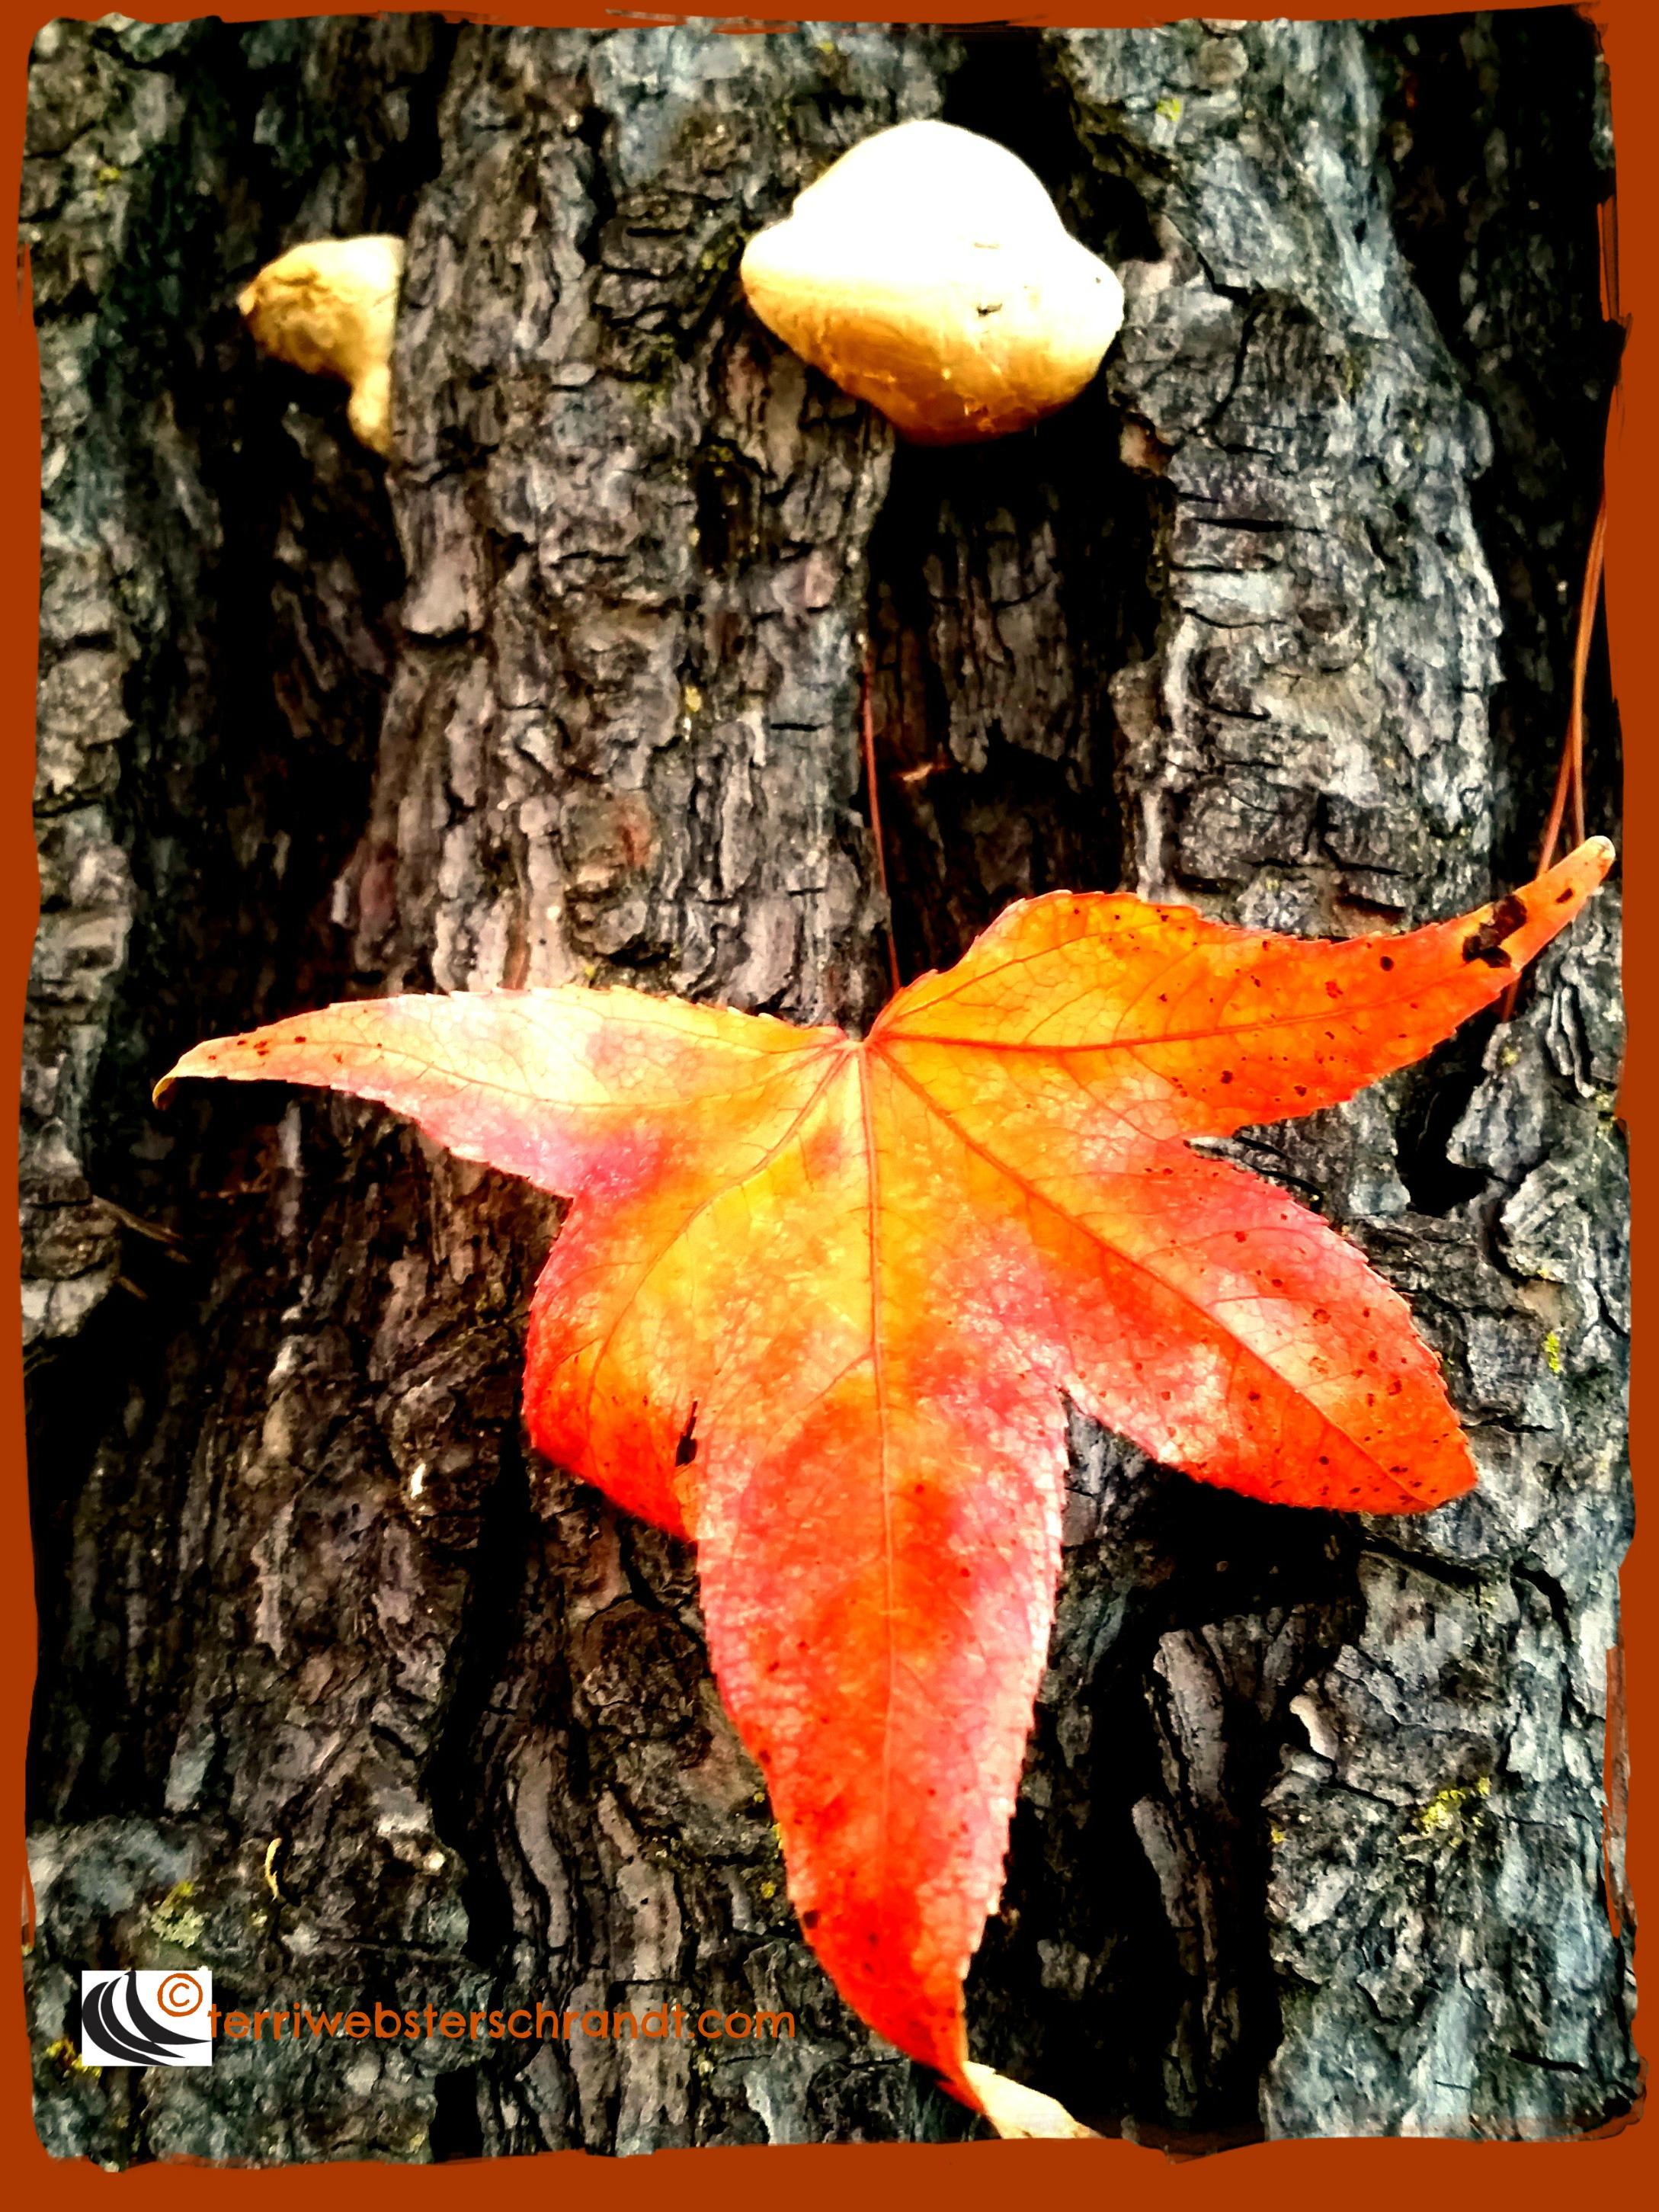 Autumn leaf on wood shows it's splendor